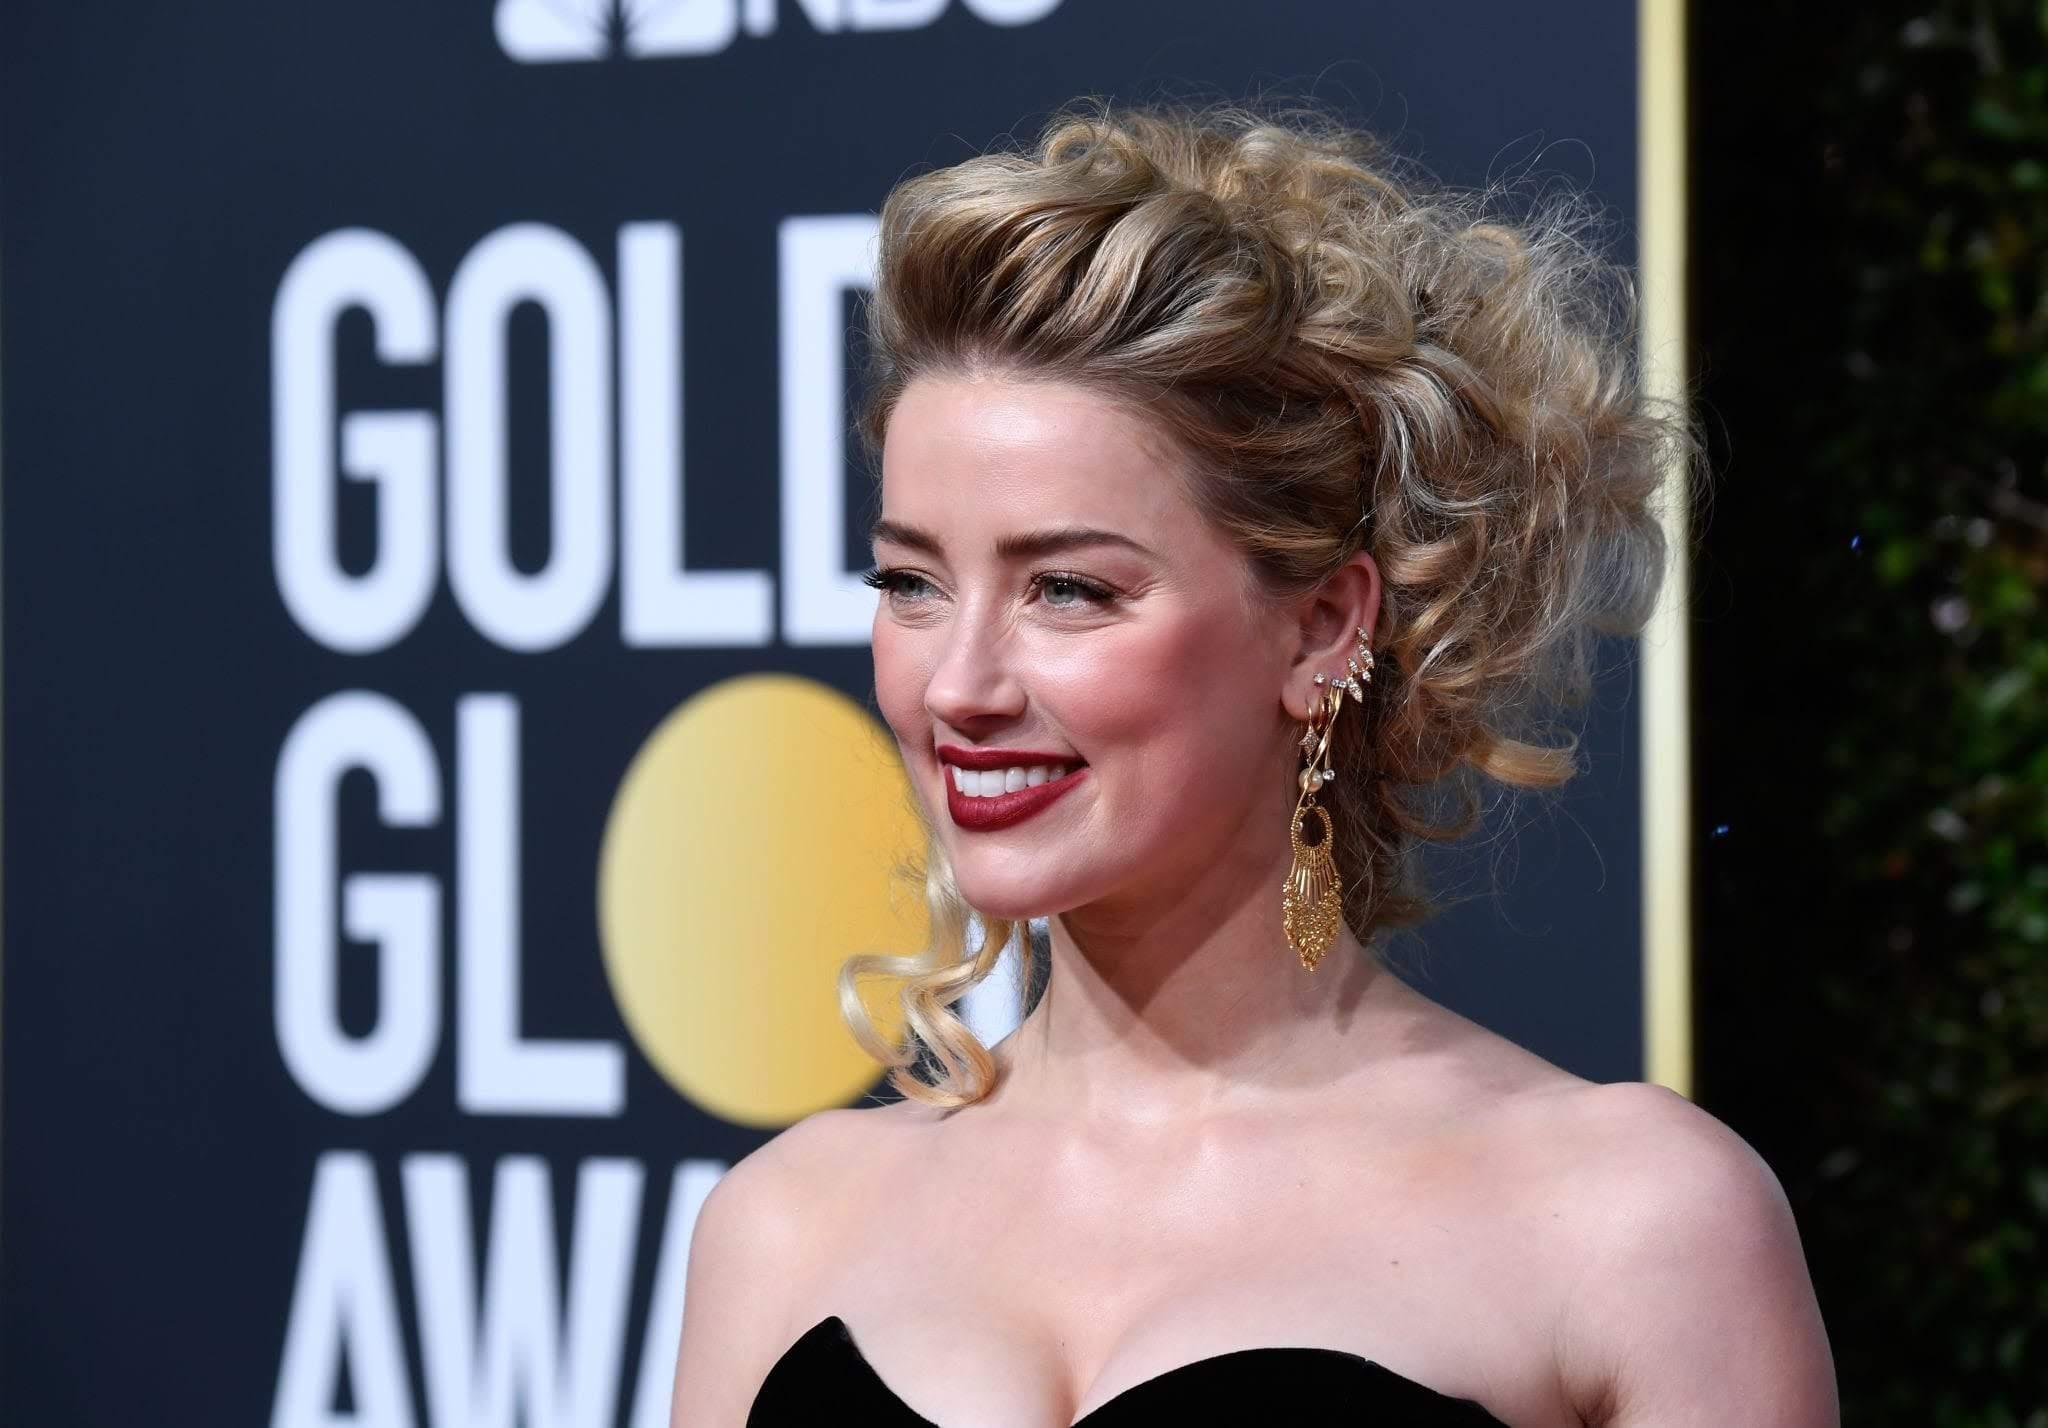 Amber Heard at the 76th Golden Globe Awards : 第76回 ゴールデン・グローブ賞のアンバー・ハード ! !